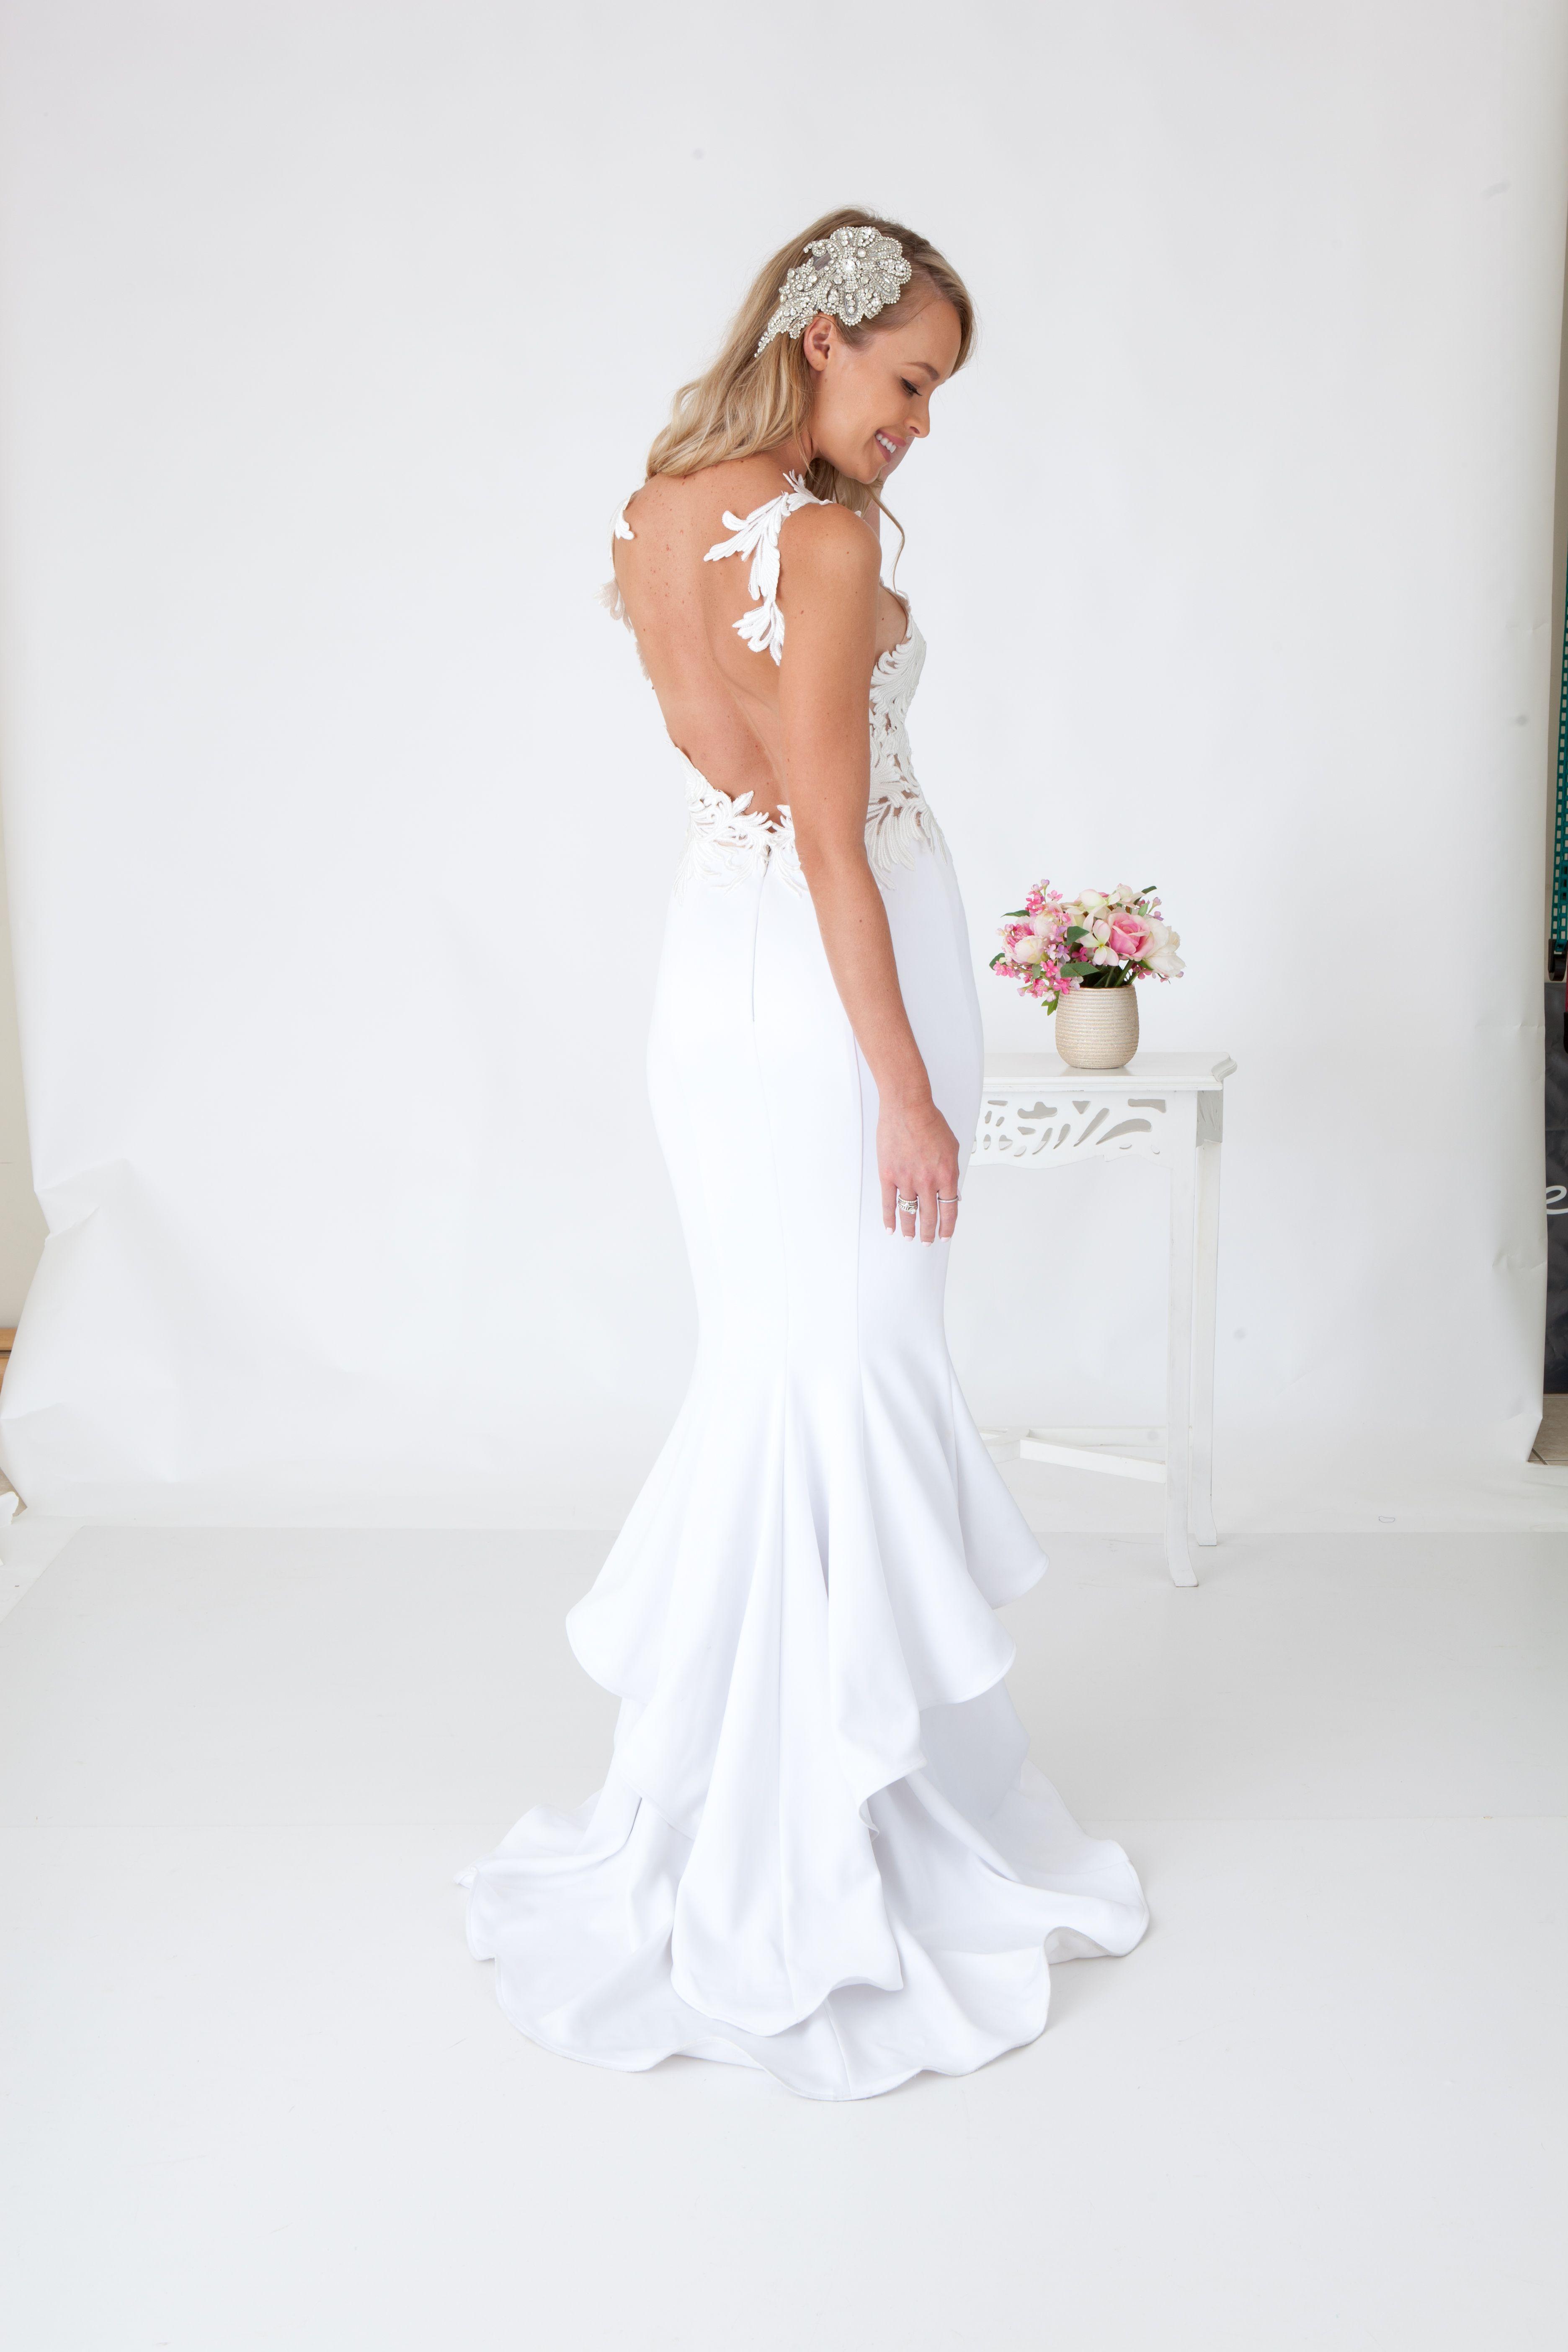 Behind the scenes at Brisbane Wedding Dress Designers